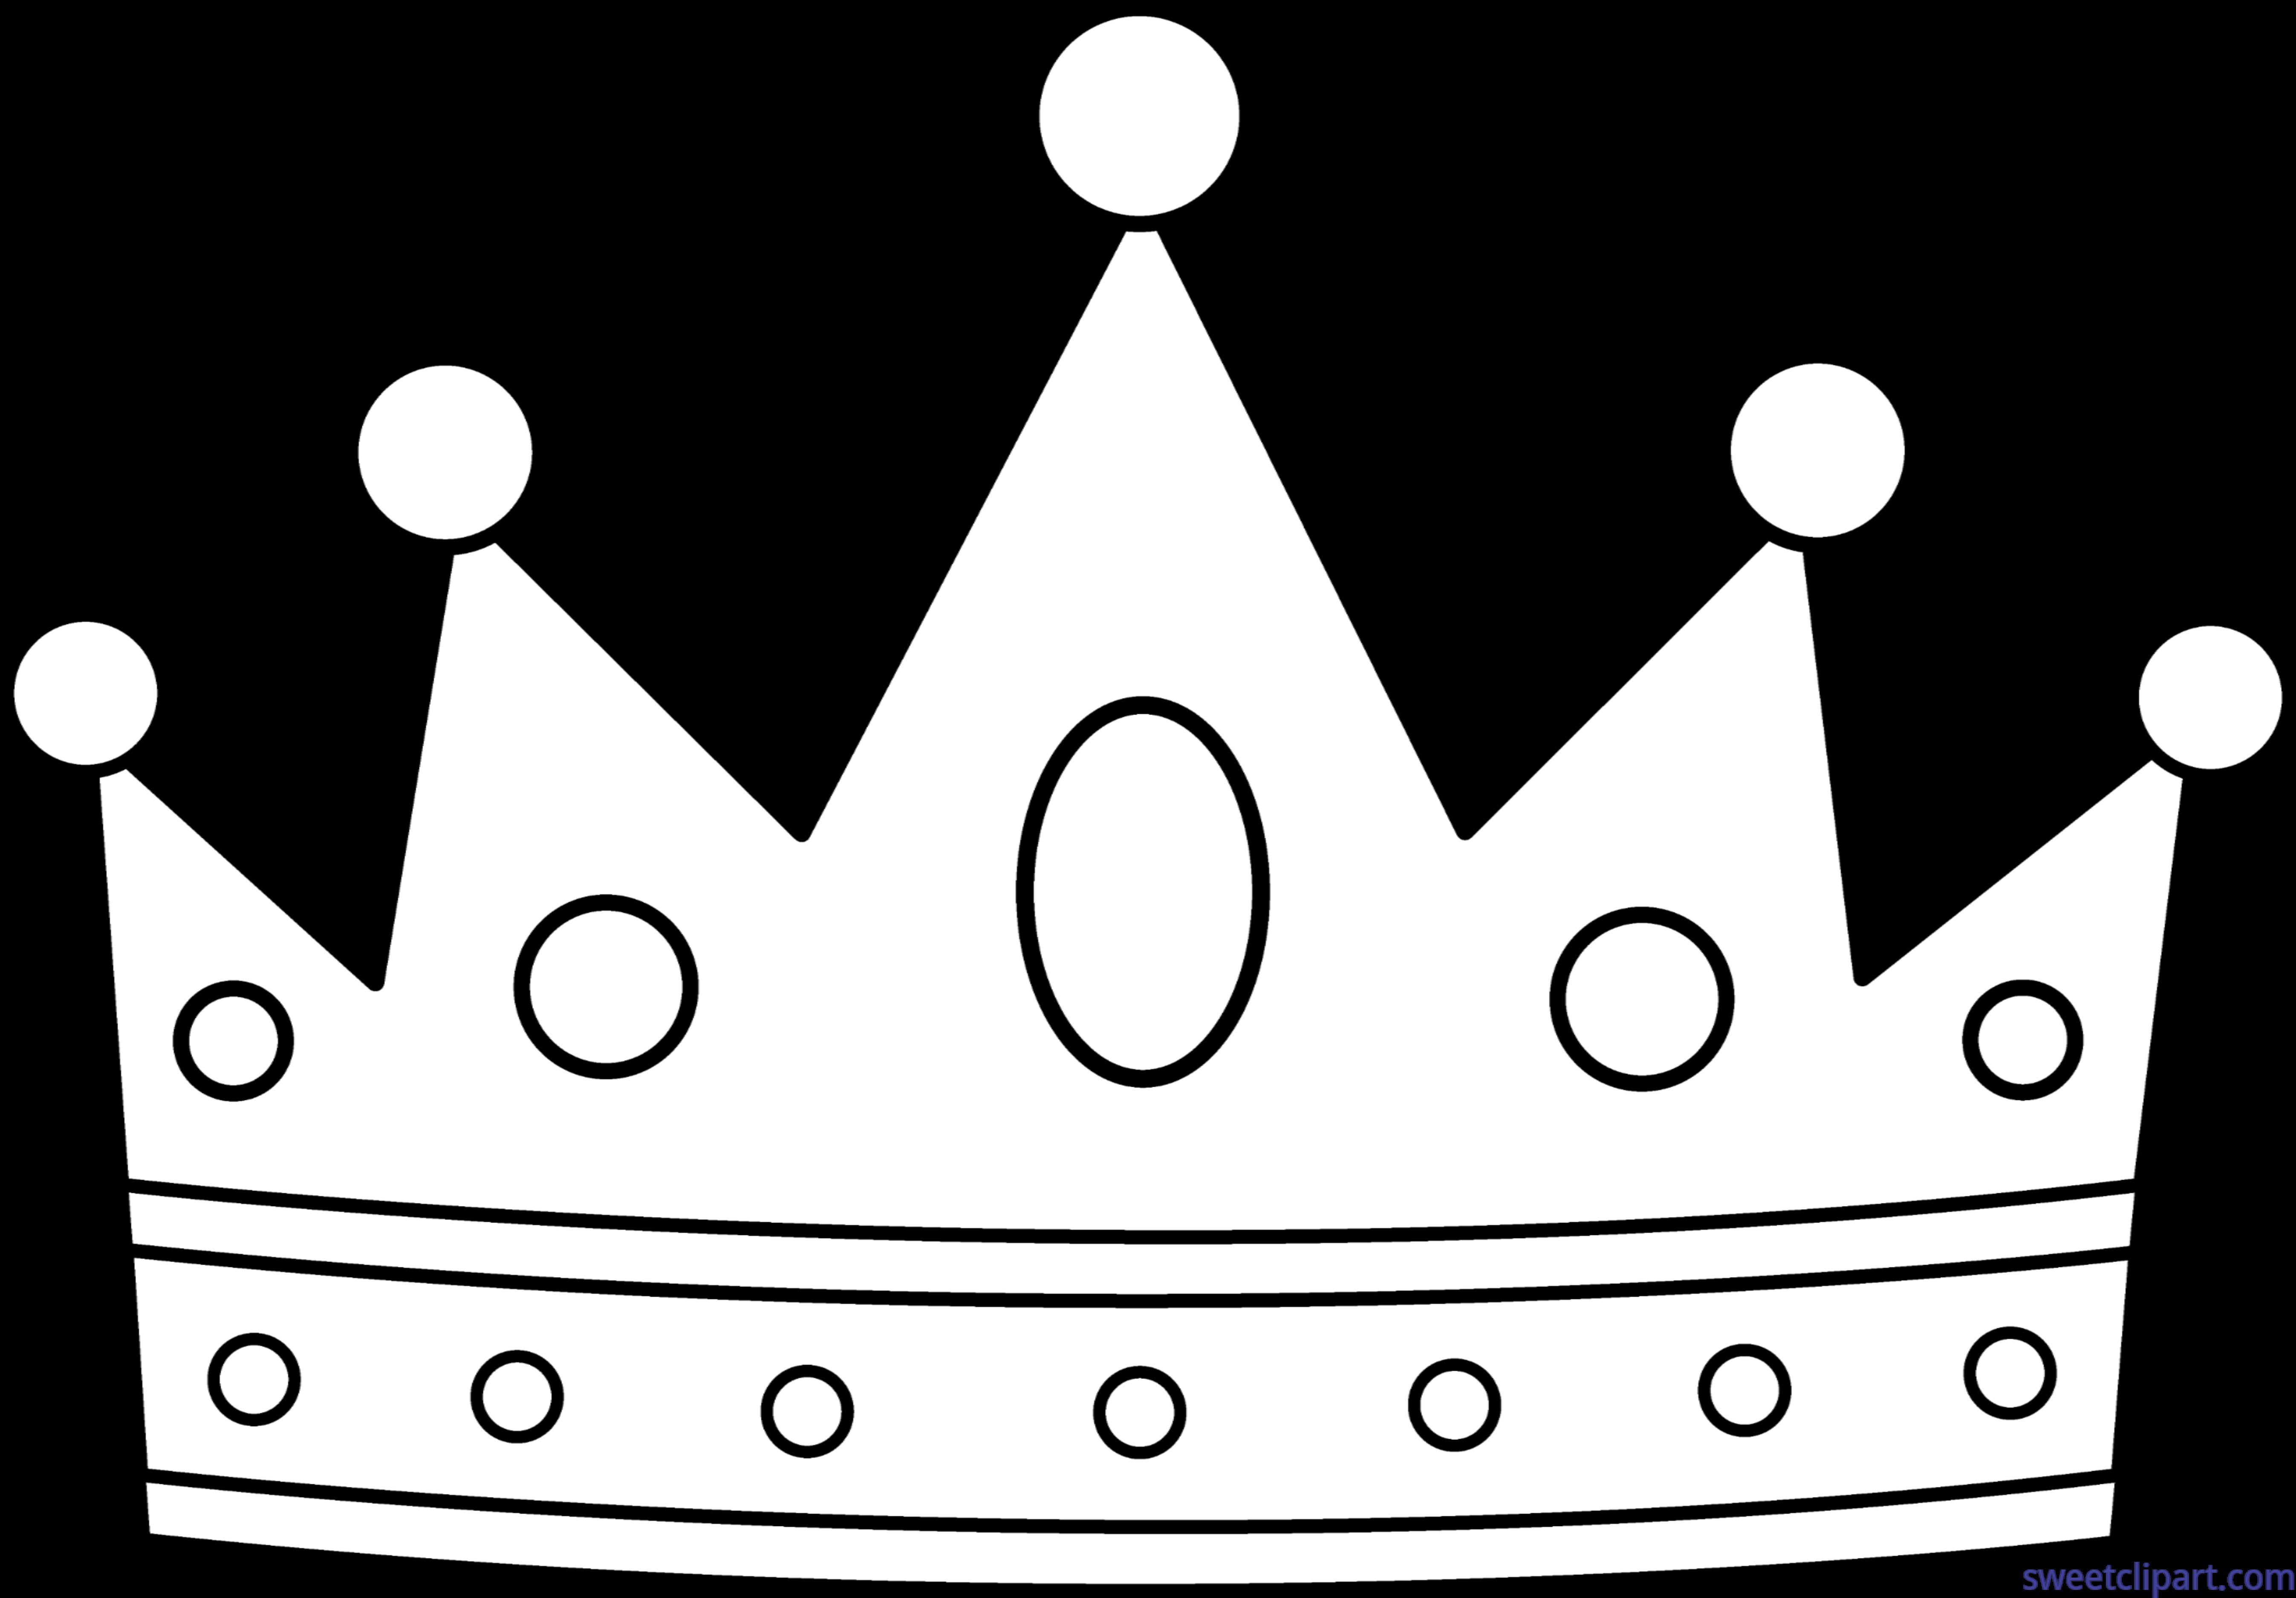 Crowns clipart rainbow. Crown lineart clip art